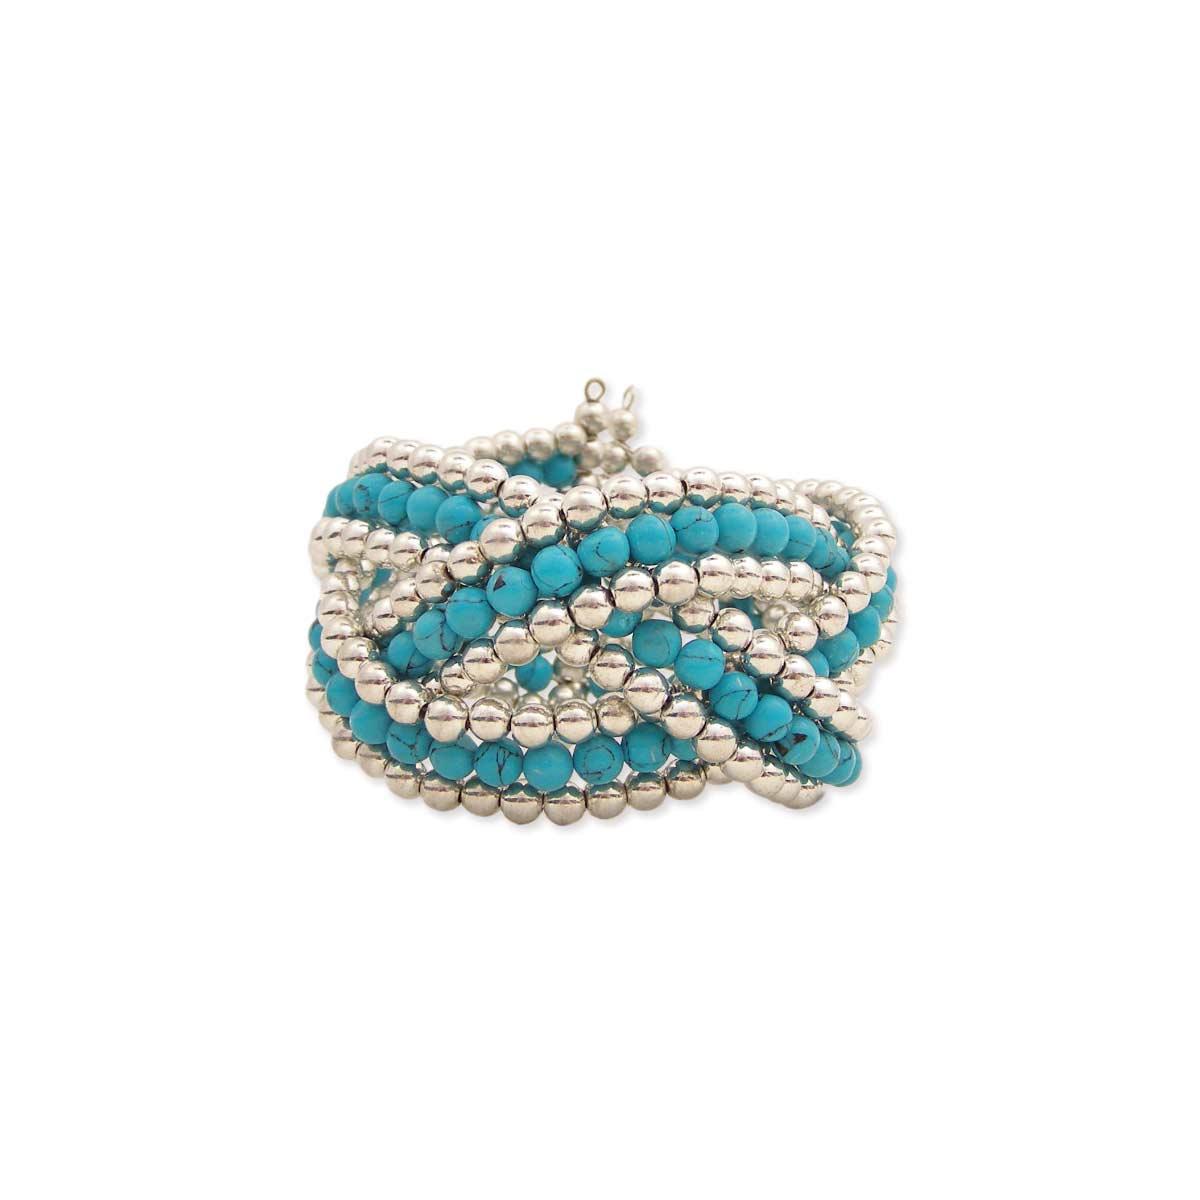 Silver & Turquoise Bead Cuff Bracelet